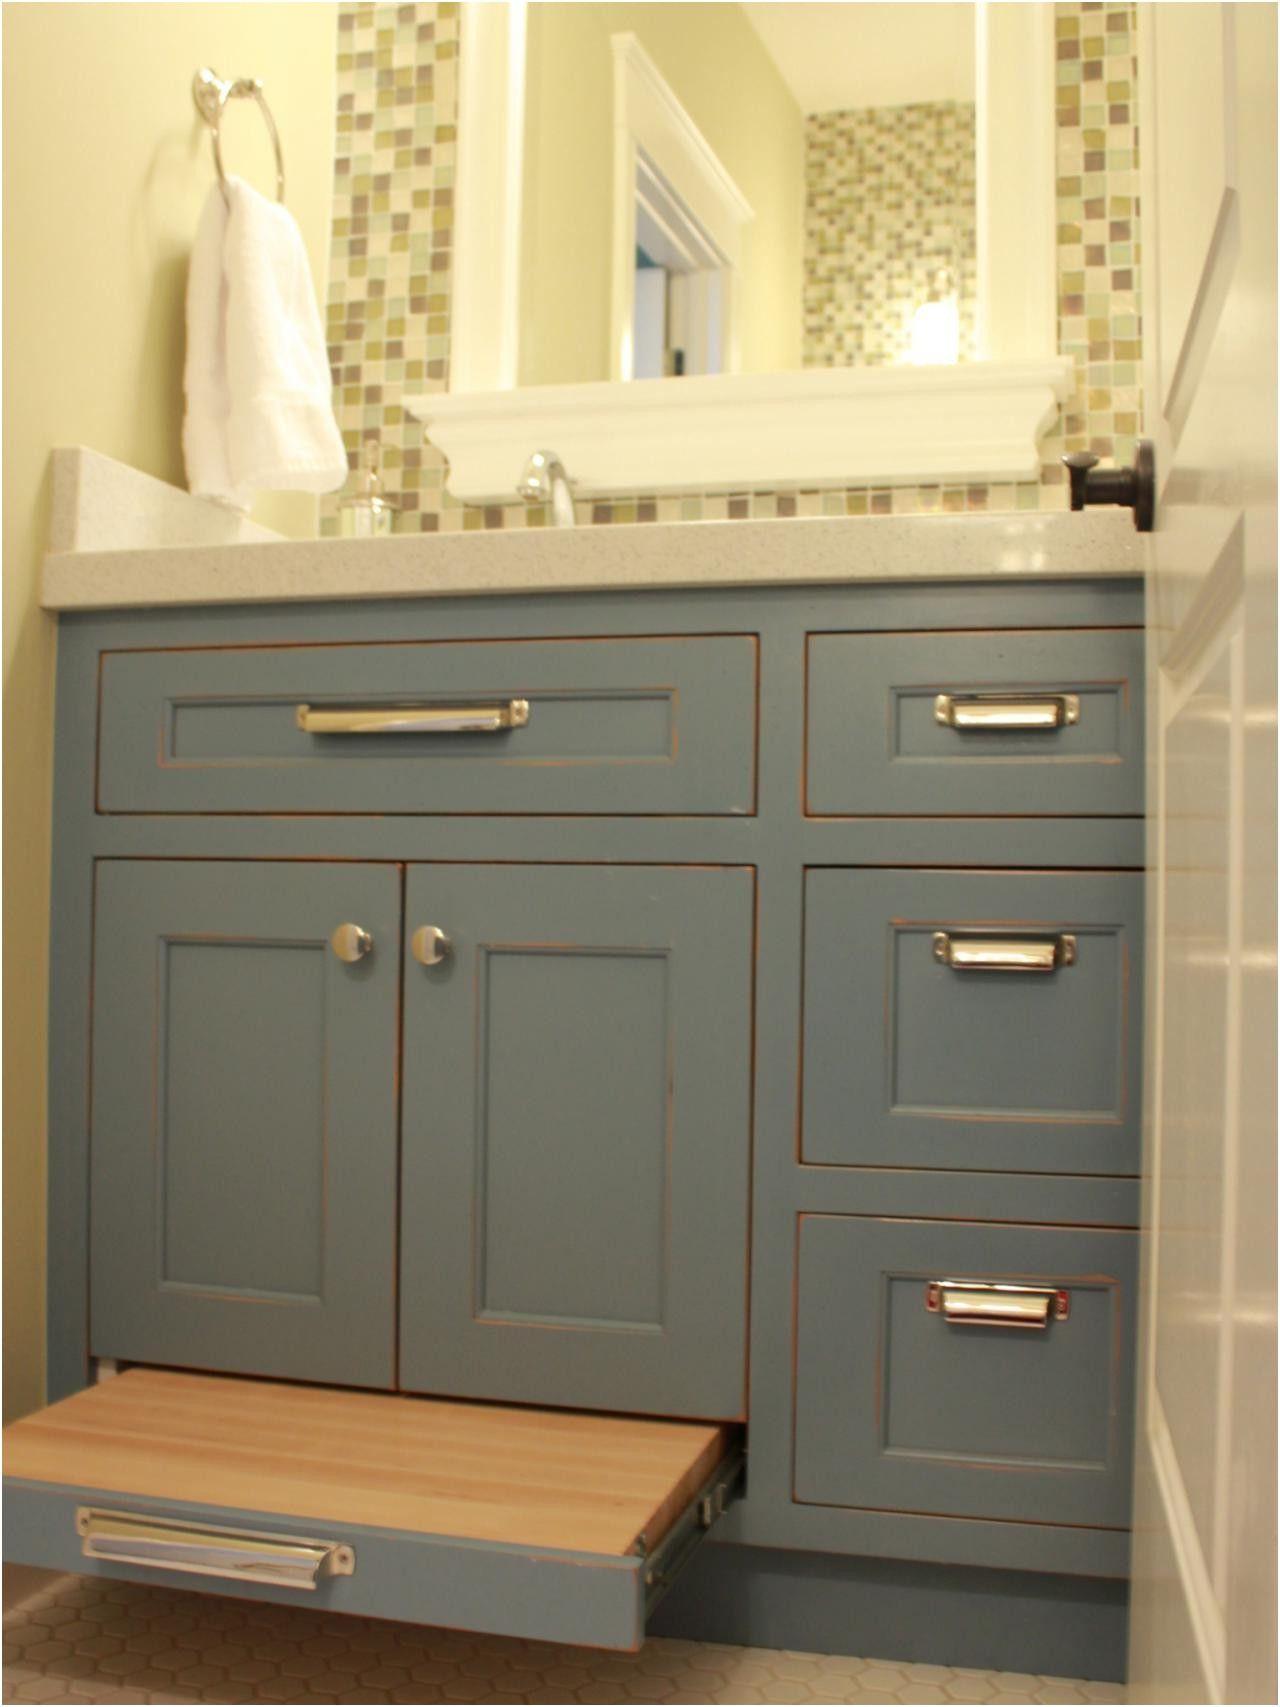 Bathroom Menards Bathroom Vanity For Inspiring Bathroom Cabinet From - Menards bathroom storage cabinets